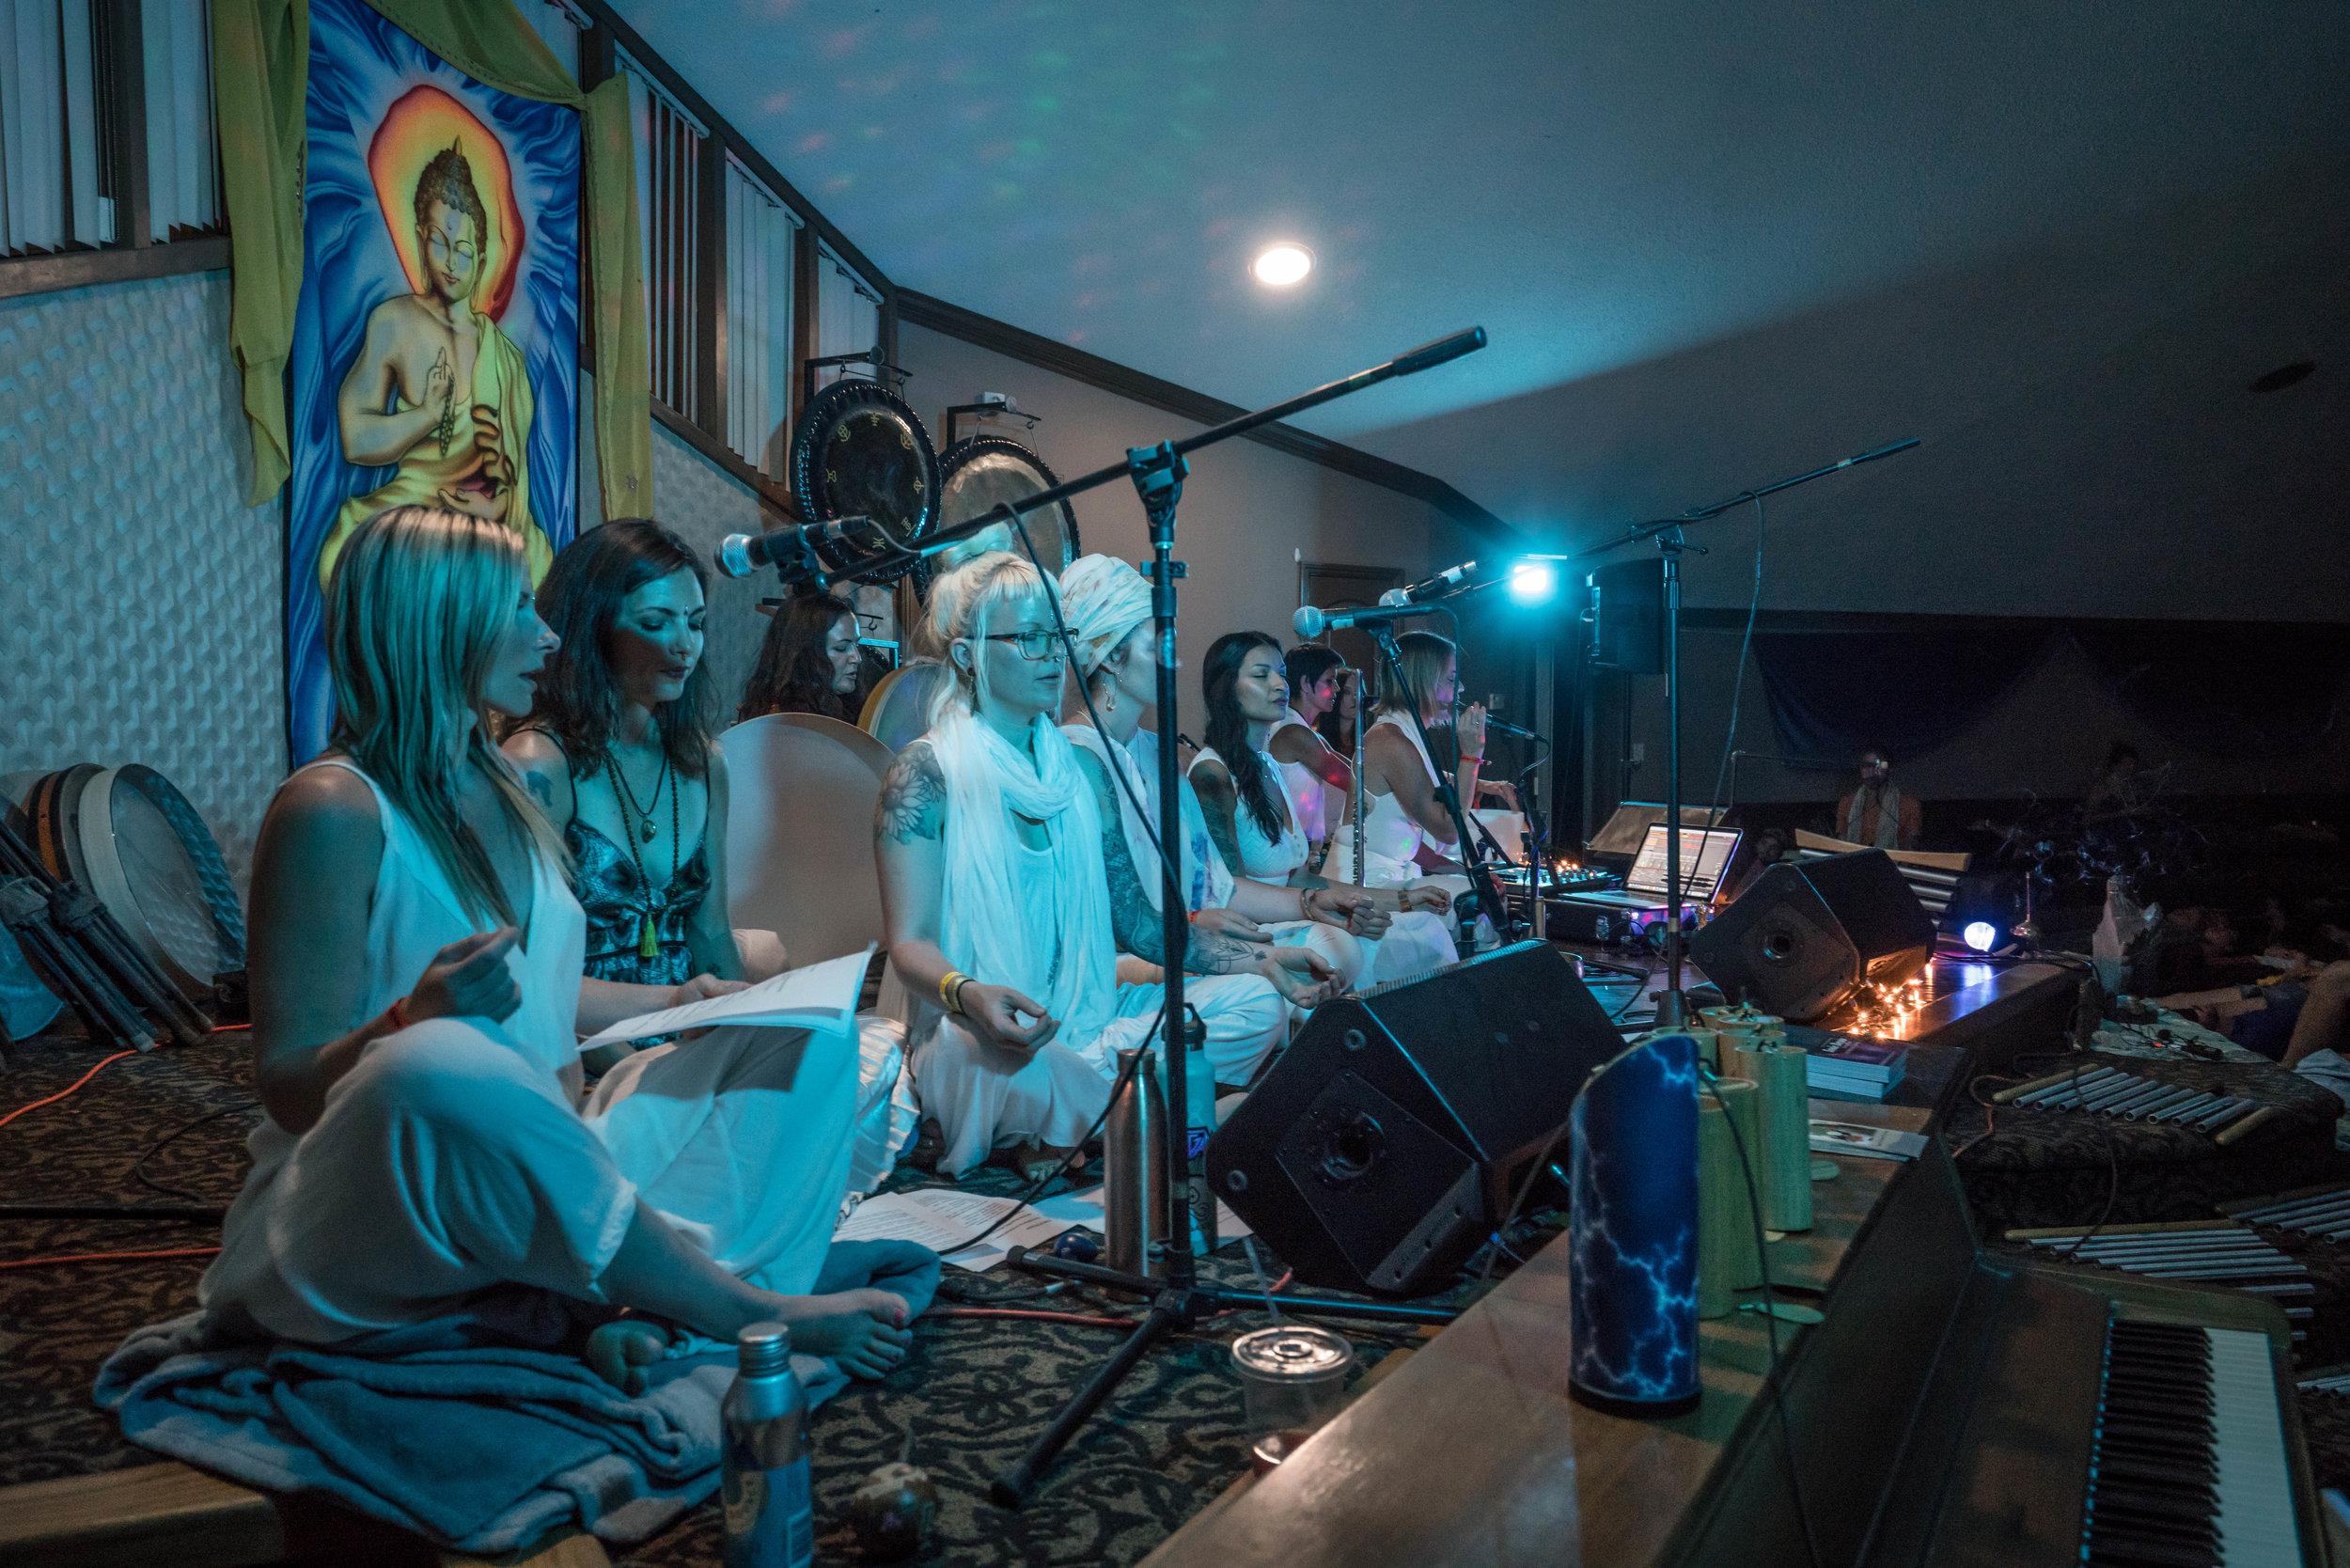 2018.09.14_Bhakti_Fest_Lynda_Arnold_DSC03612.jpg